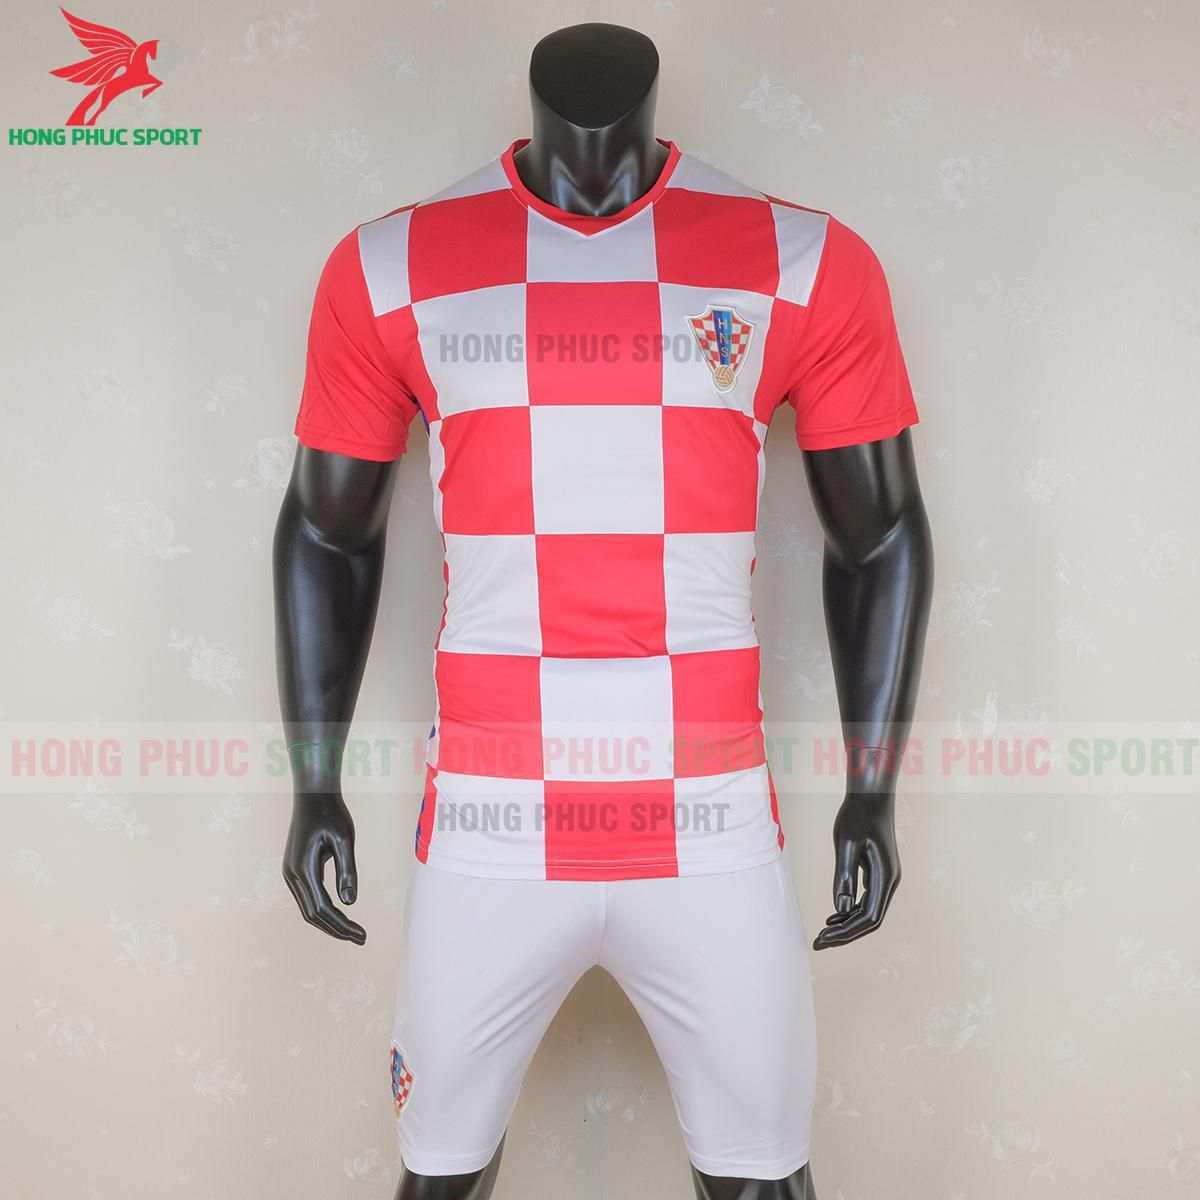 https://cdn.hongphucsport.com/unsafe/s4.shopbay.vn/files/285/ao-bong-da-tuyen-croatia-2020-san-nha-mau-1-8-5f7147bfbb2f2.jpg